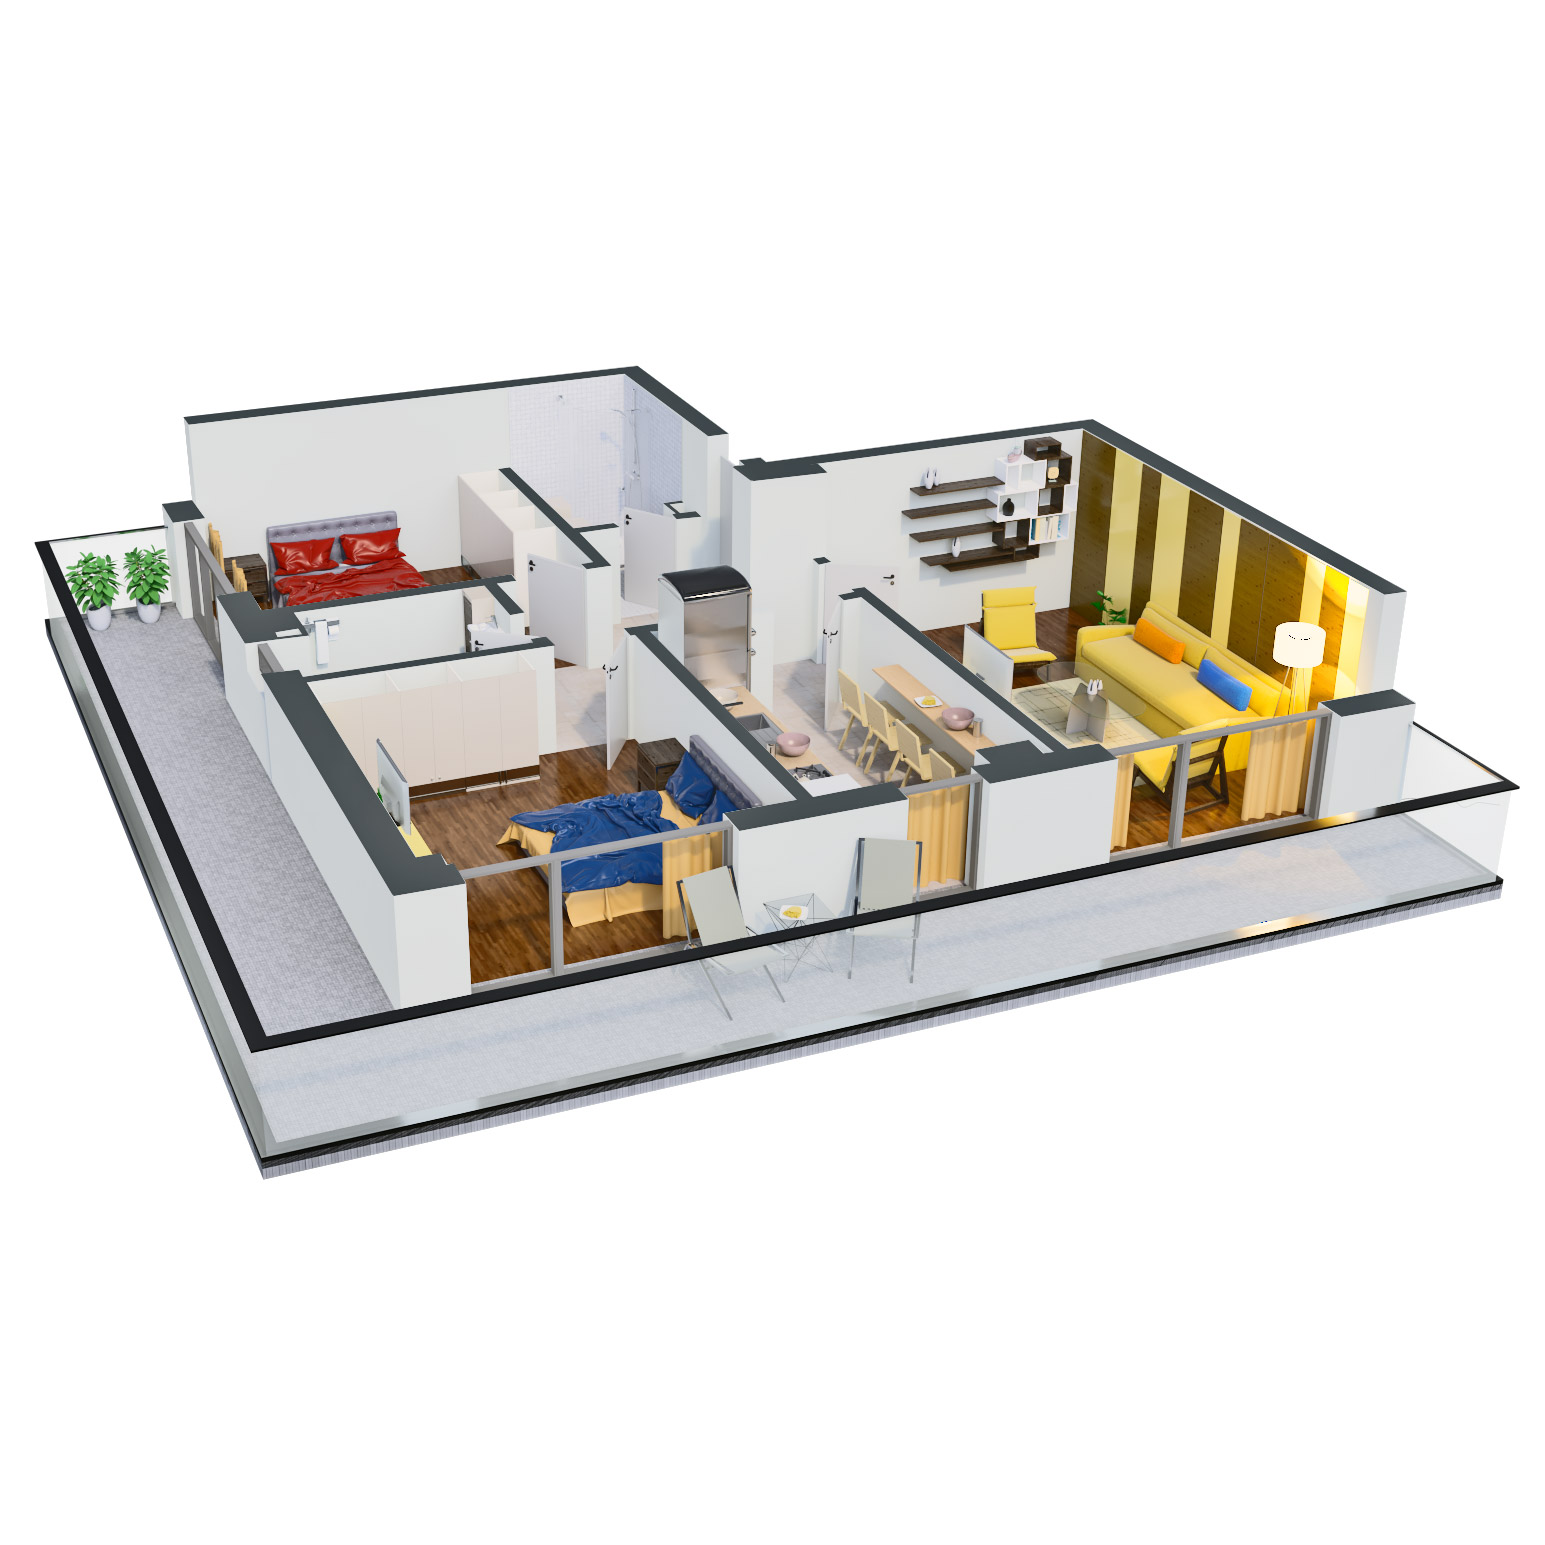 Apartament 3 camere de vanzare Bucuresti - Catedral Residence - Marriott, Piata Unirii, 13 Septembrie, Izvor - Tip 6 - T2 - C